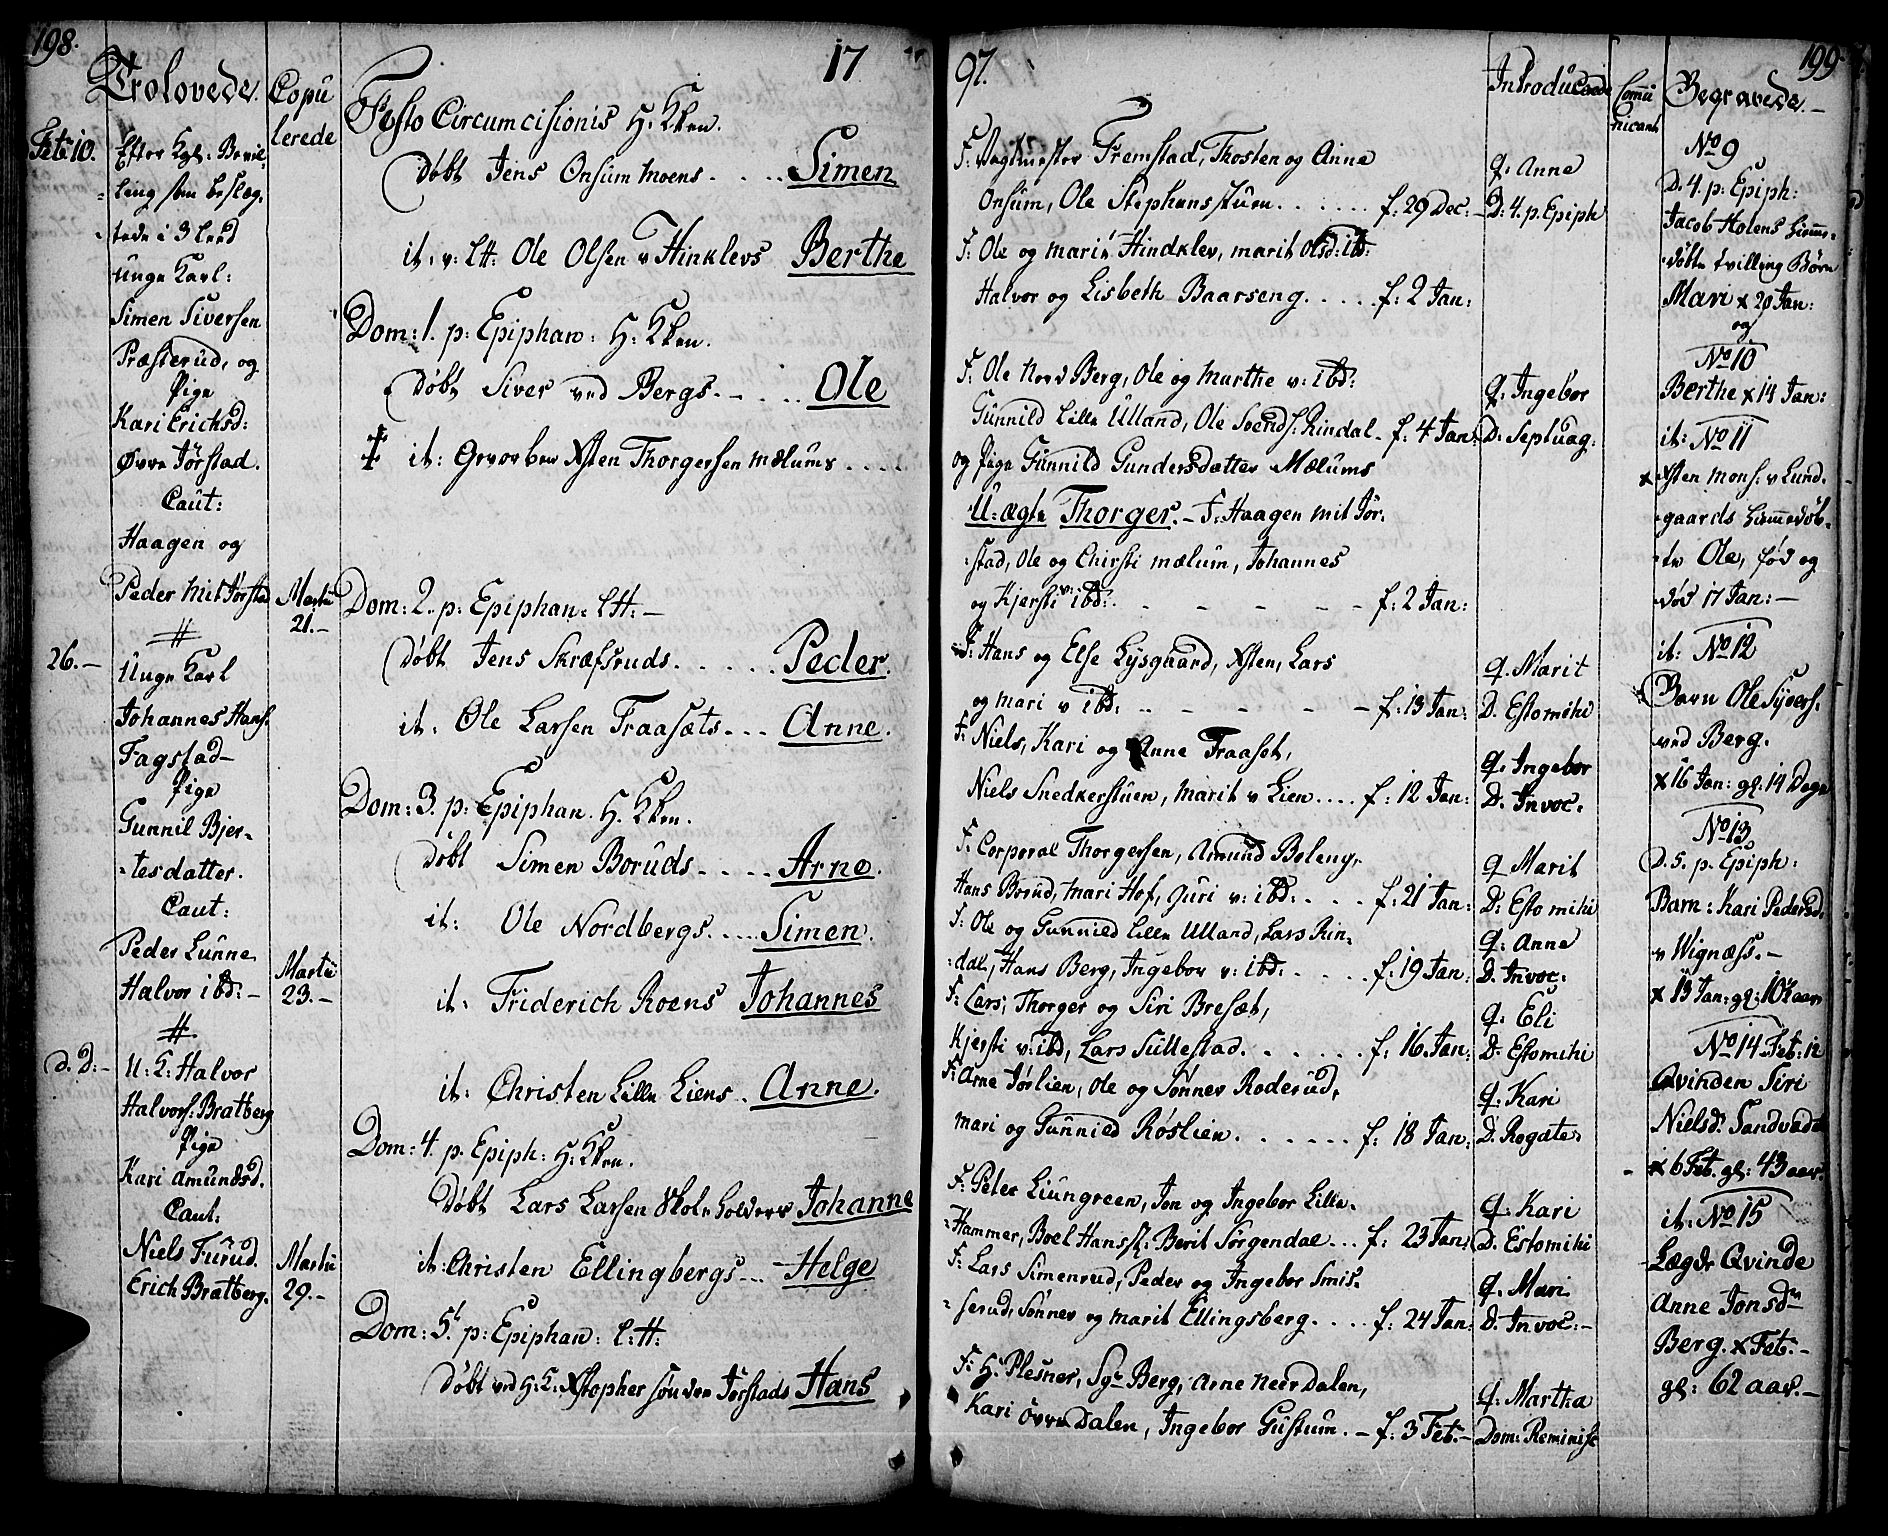 SAH, Fåberg prestekontor, Ministerialbok nr. 2, 1775-1818, s. 198-199